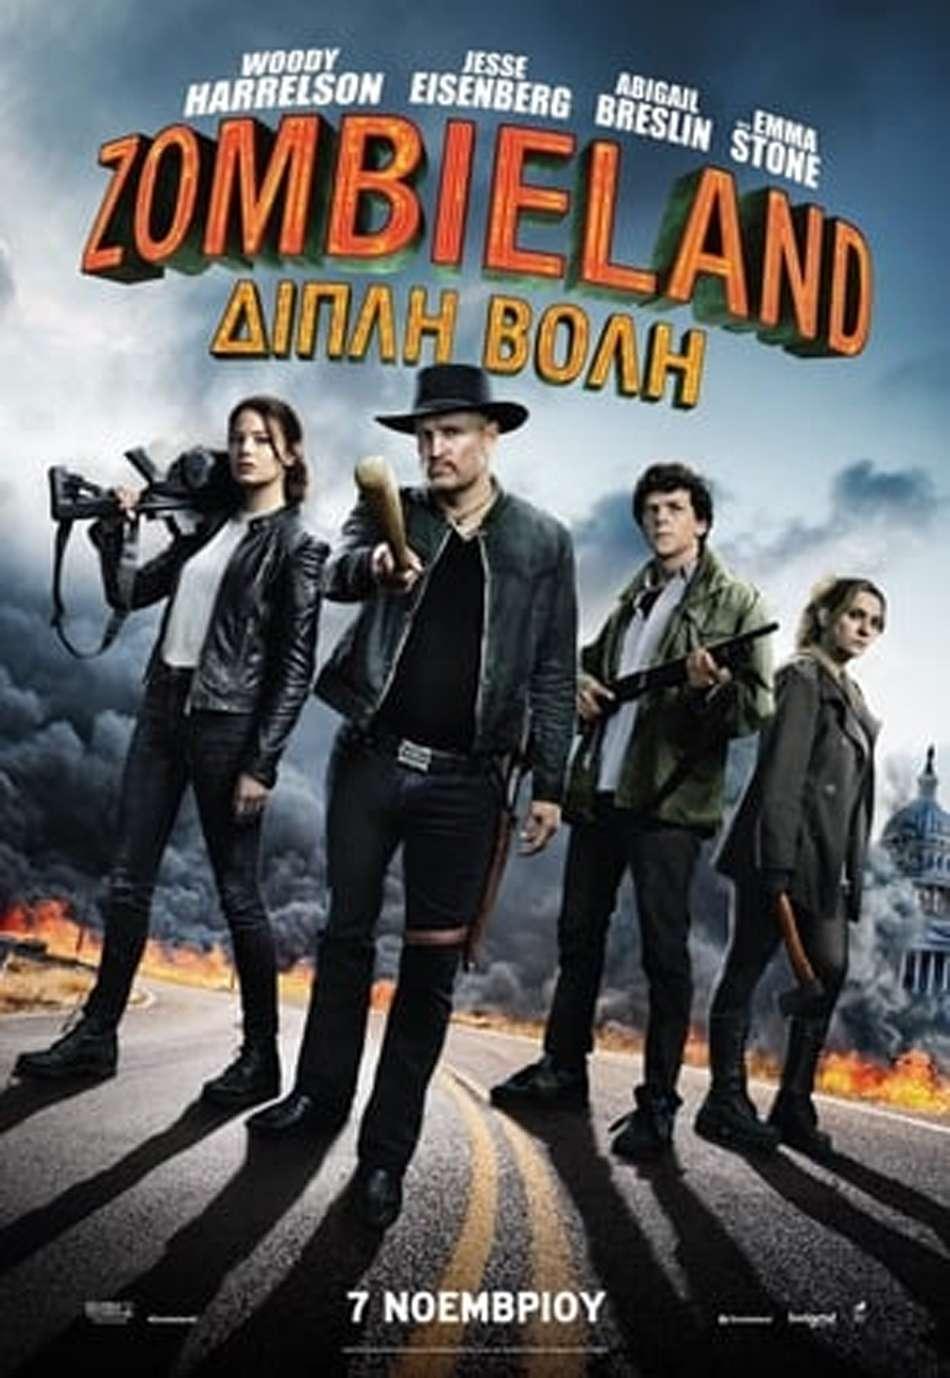 Zombieland: Διπλή βολή (Zombieland: Double Tap) Poster Πόστερ